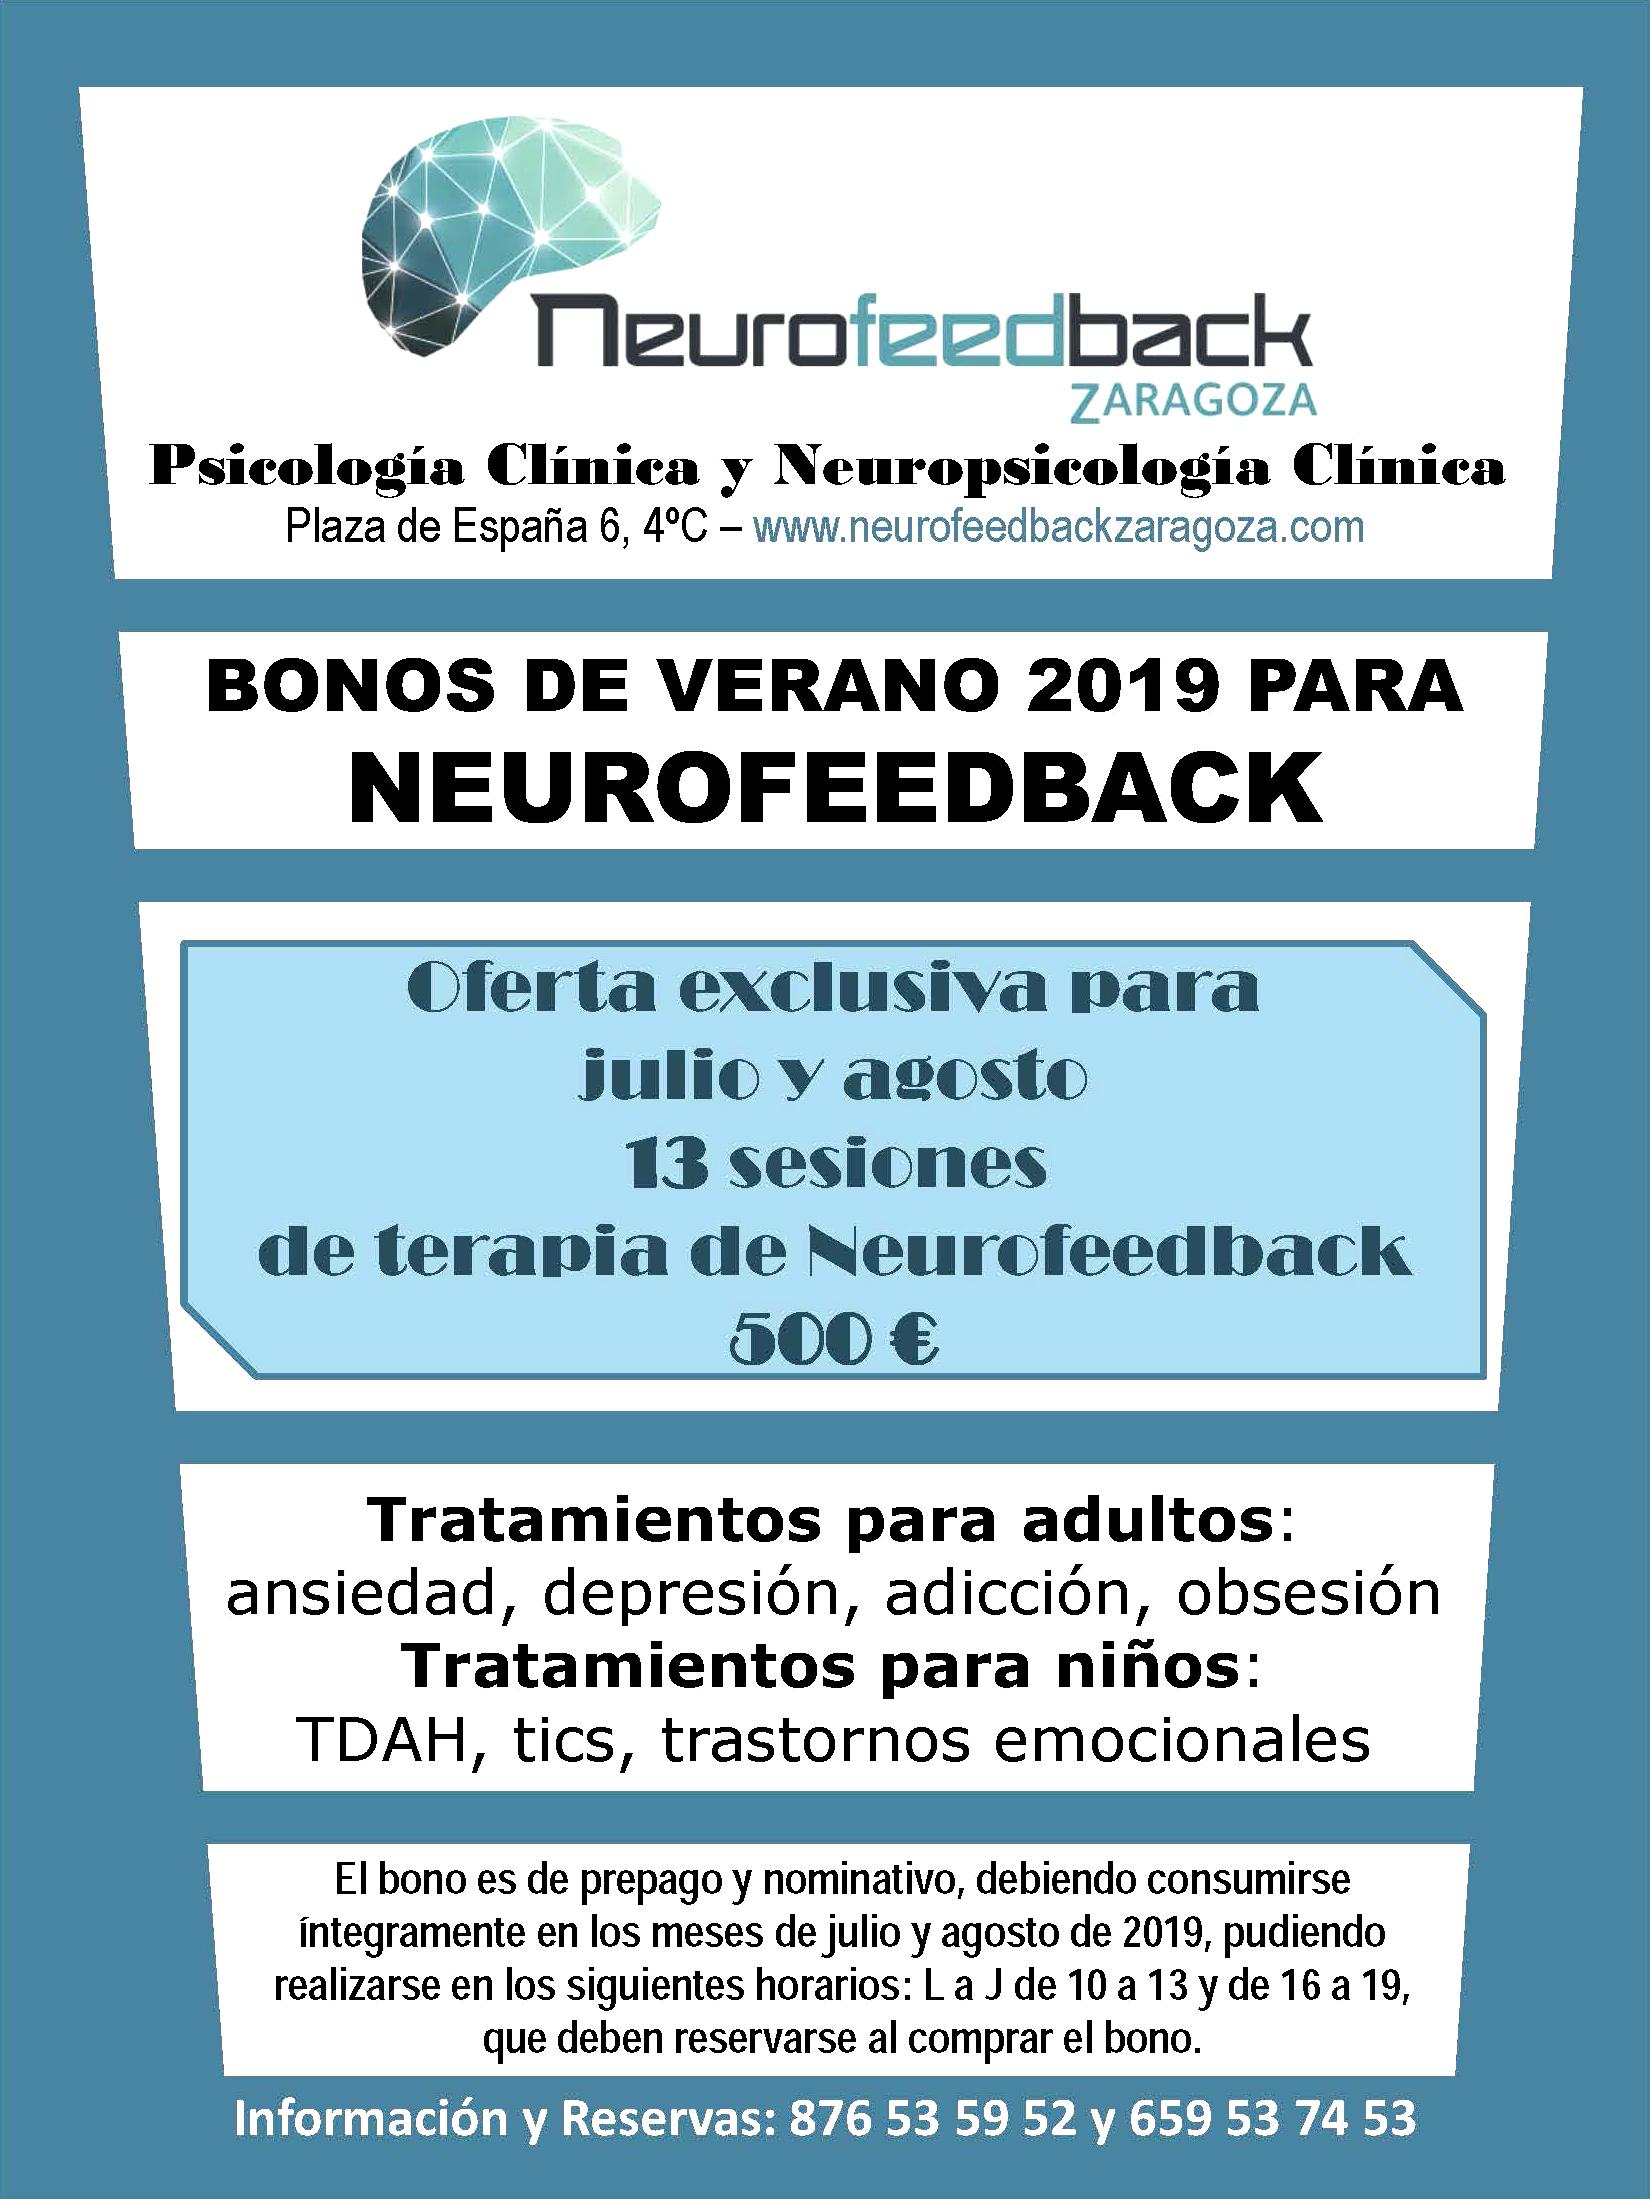 Bono, Neurofeedback, 2019